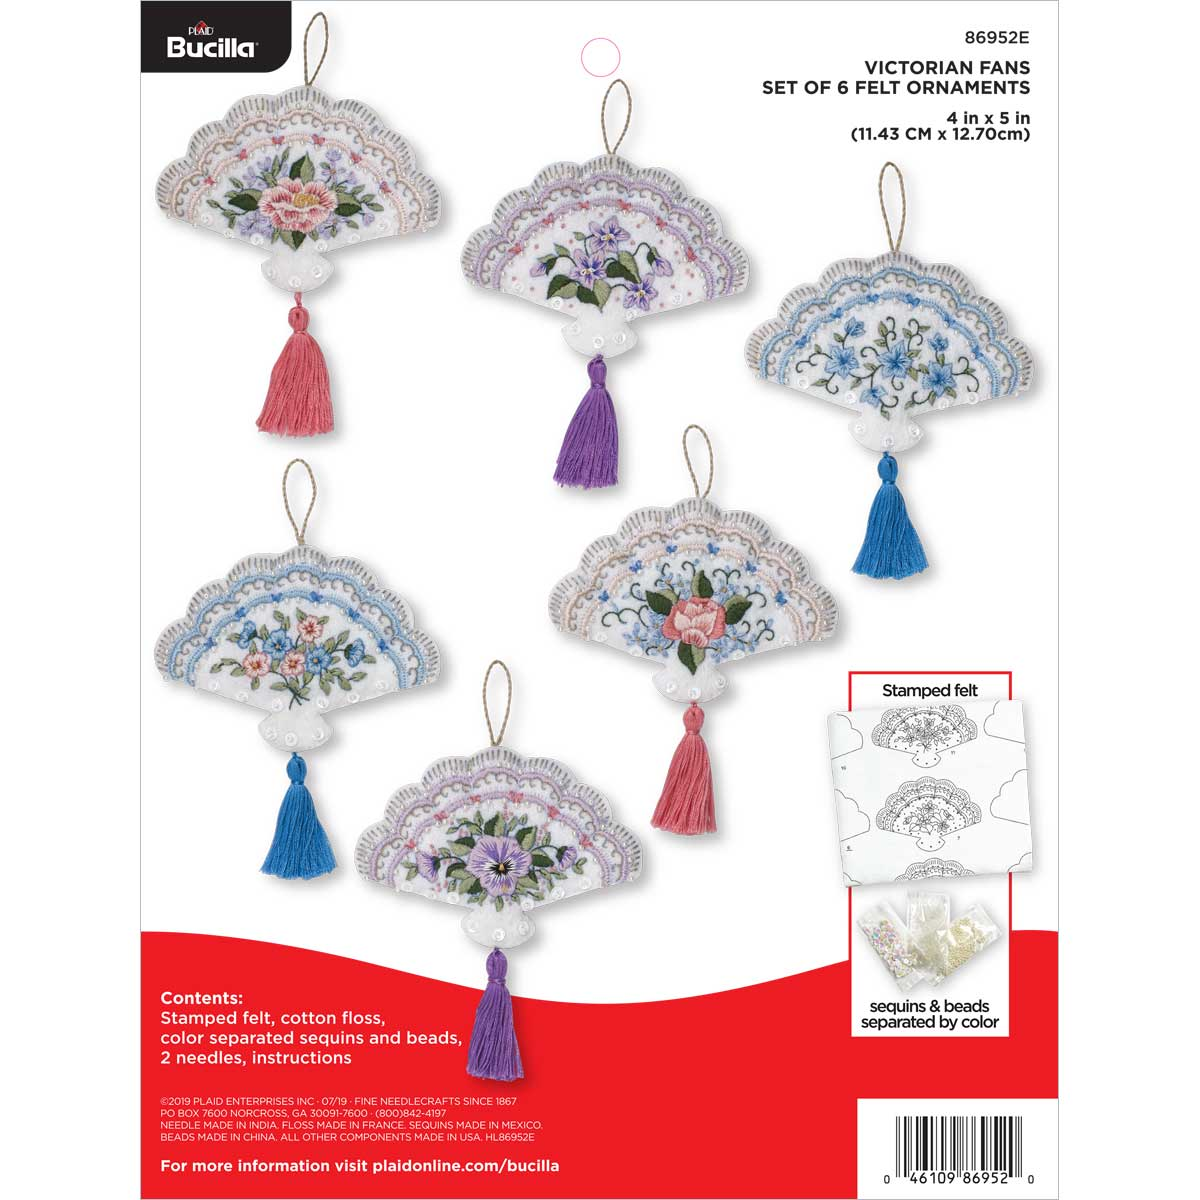 Bucilla ® Seasonal - Felt - Ornament Kits - Victorian Fans - 86952E